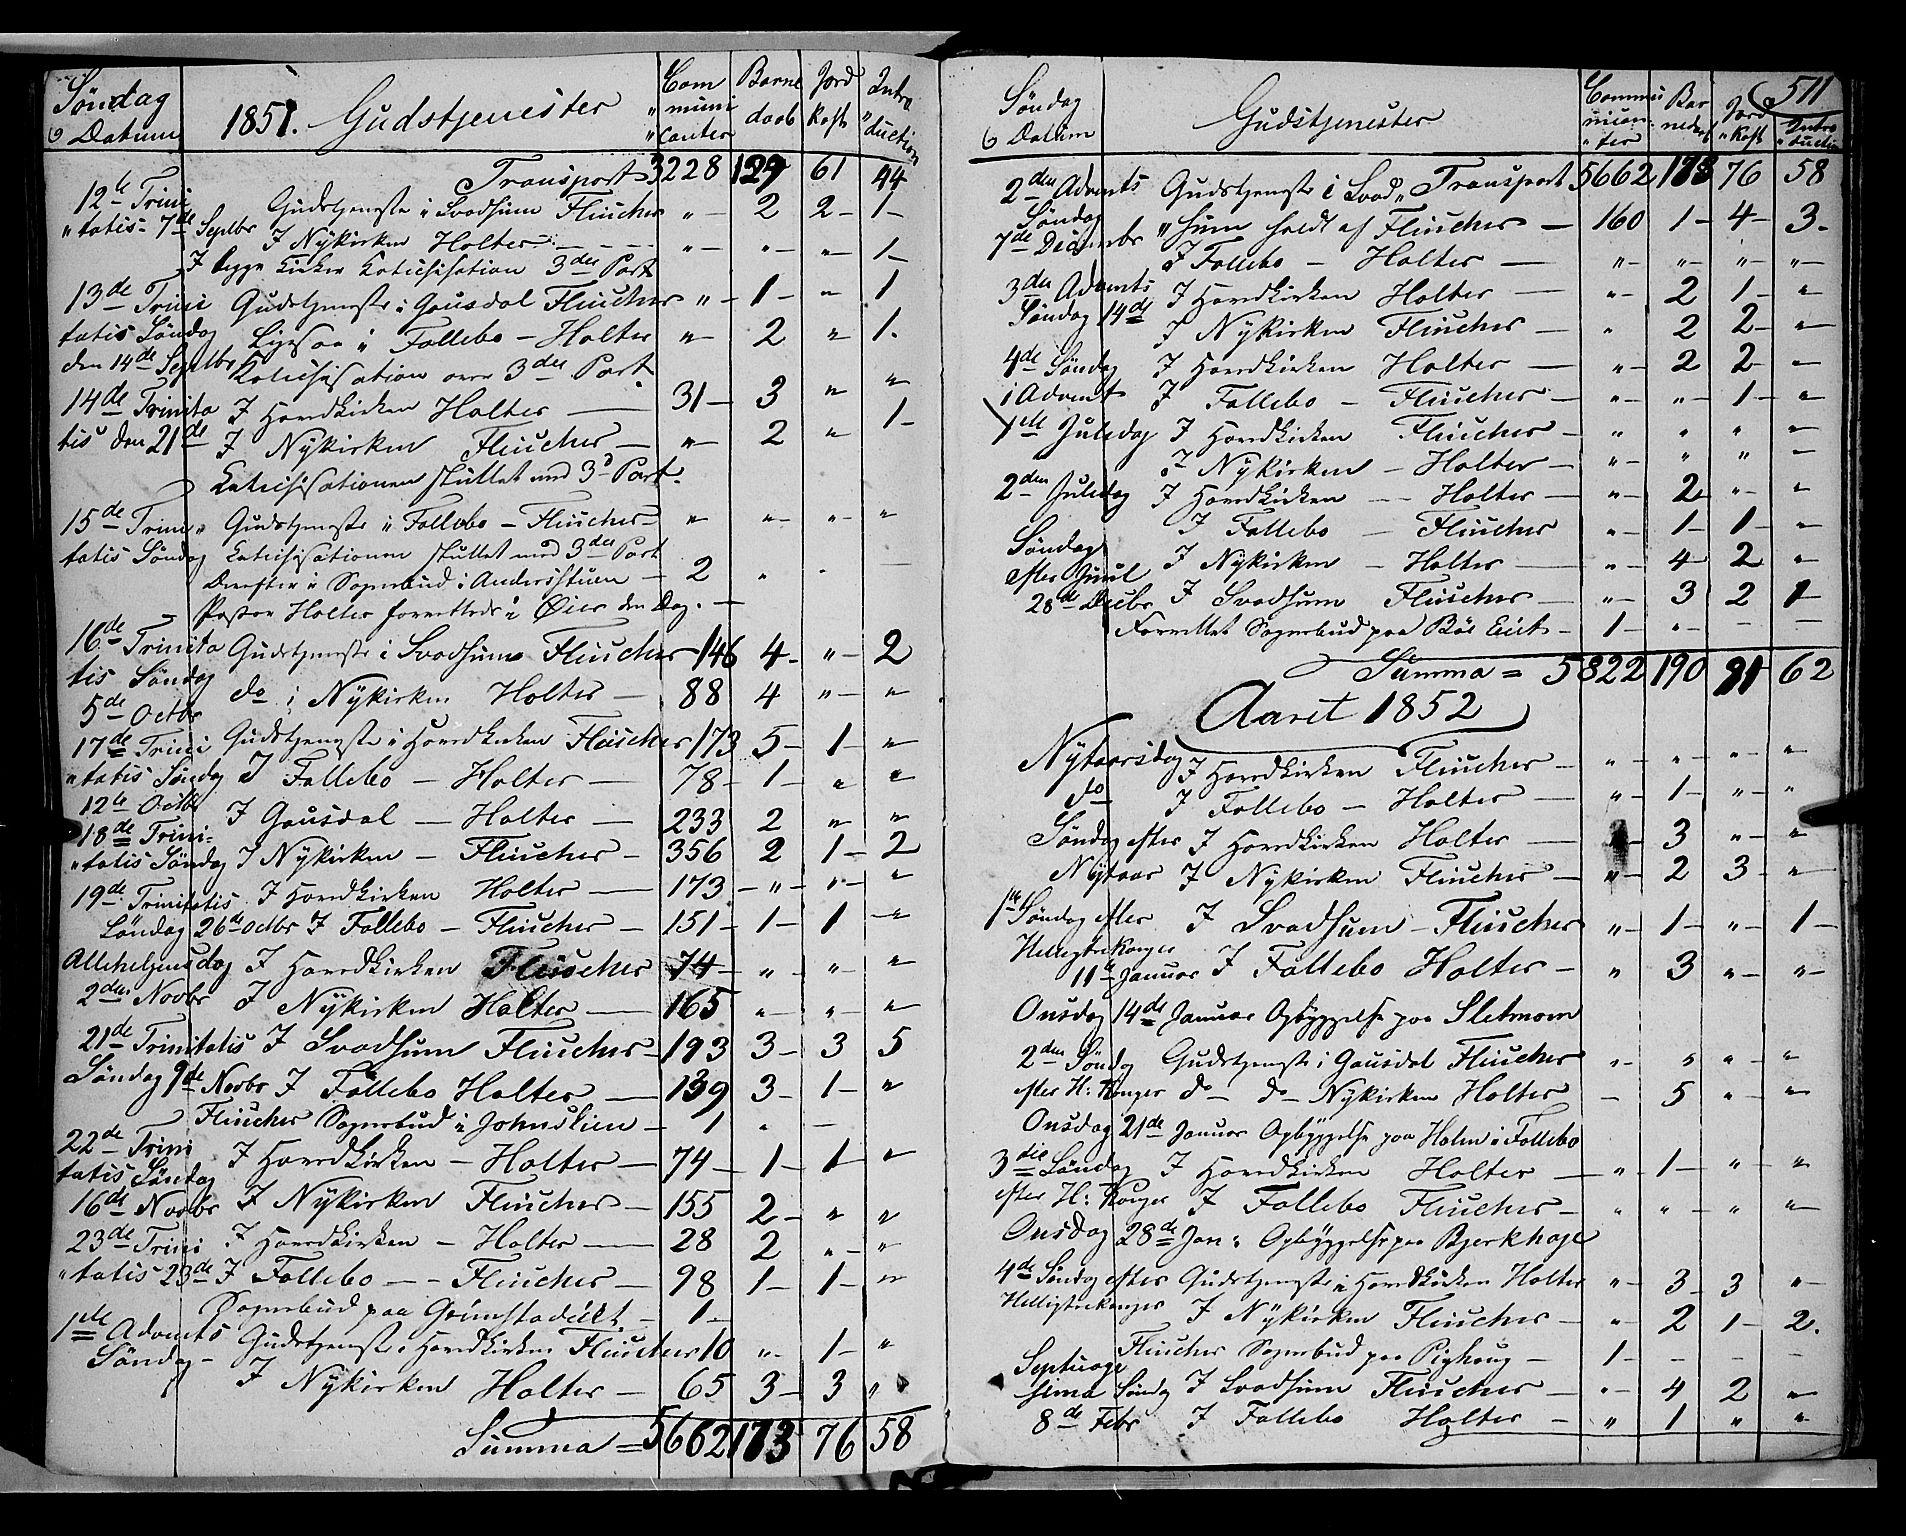 SAH, Gausdal prestekontor, Ministerialbok nr. 8, 1850-1861, s. 511